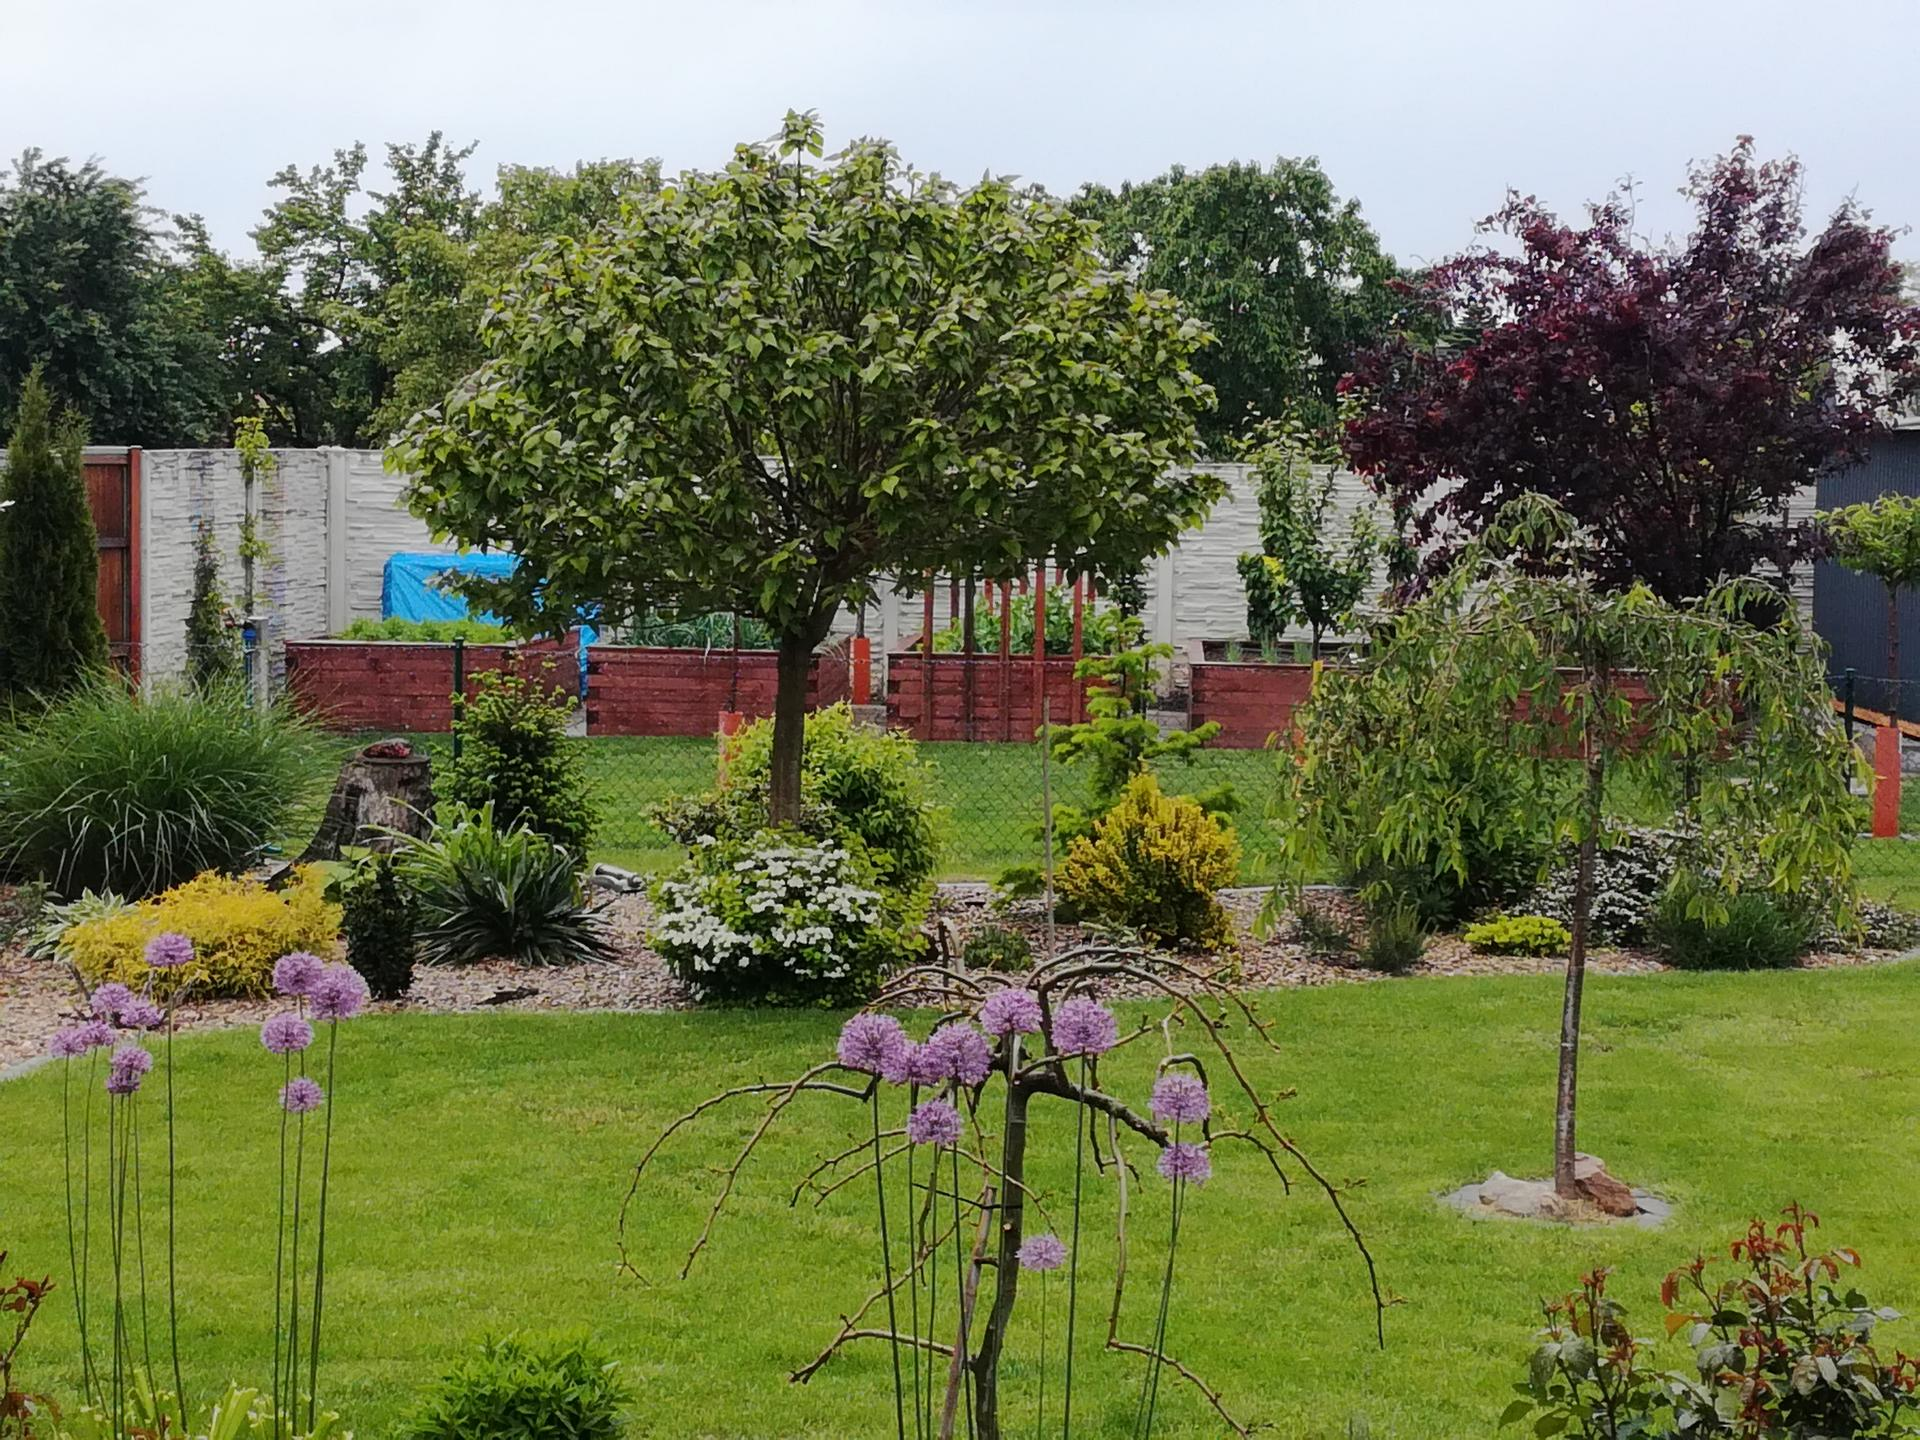 Zahrada 2021 🌲 - Obrázek č. 99